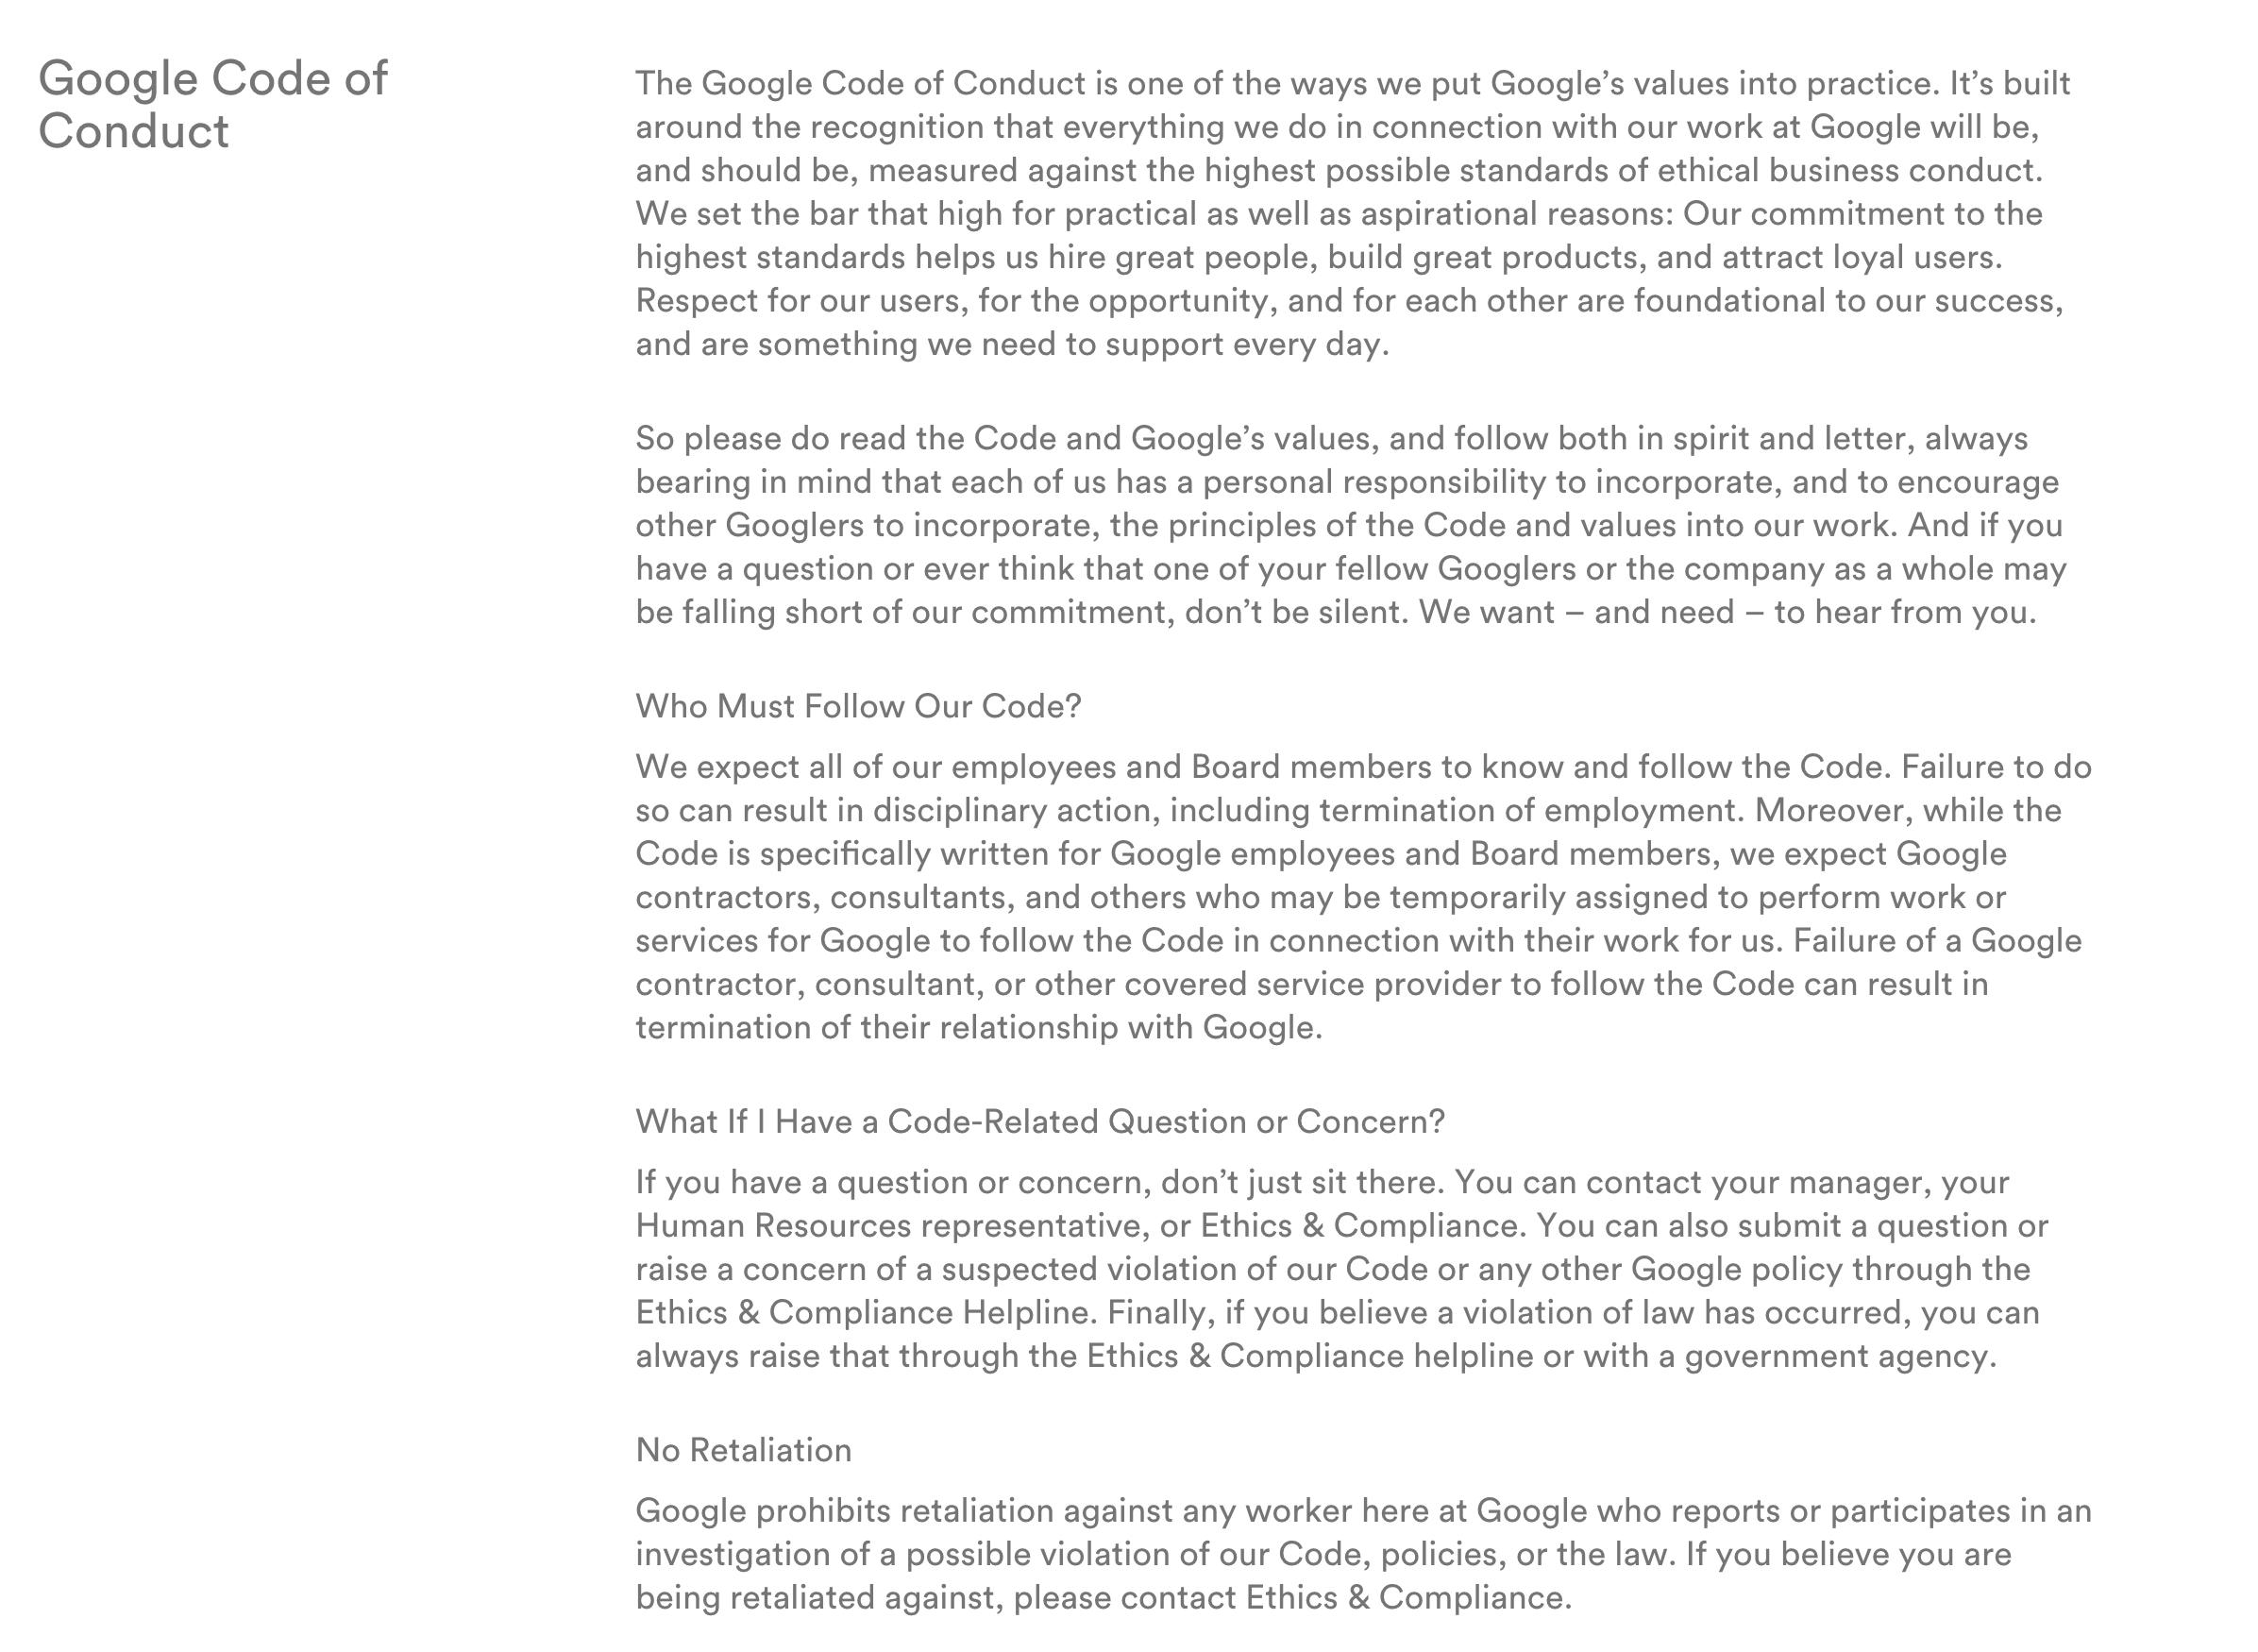 Google Employee Handbook Sample